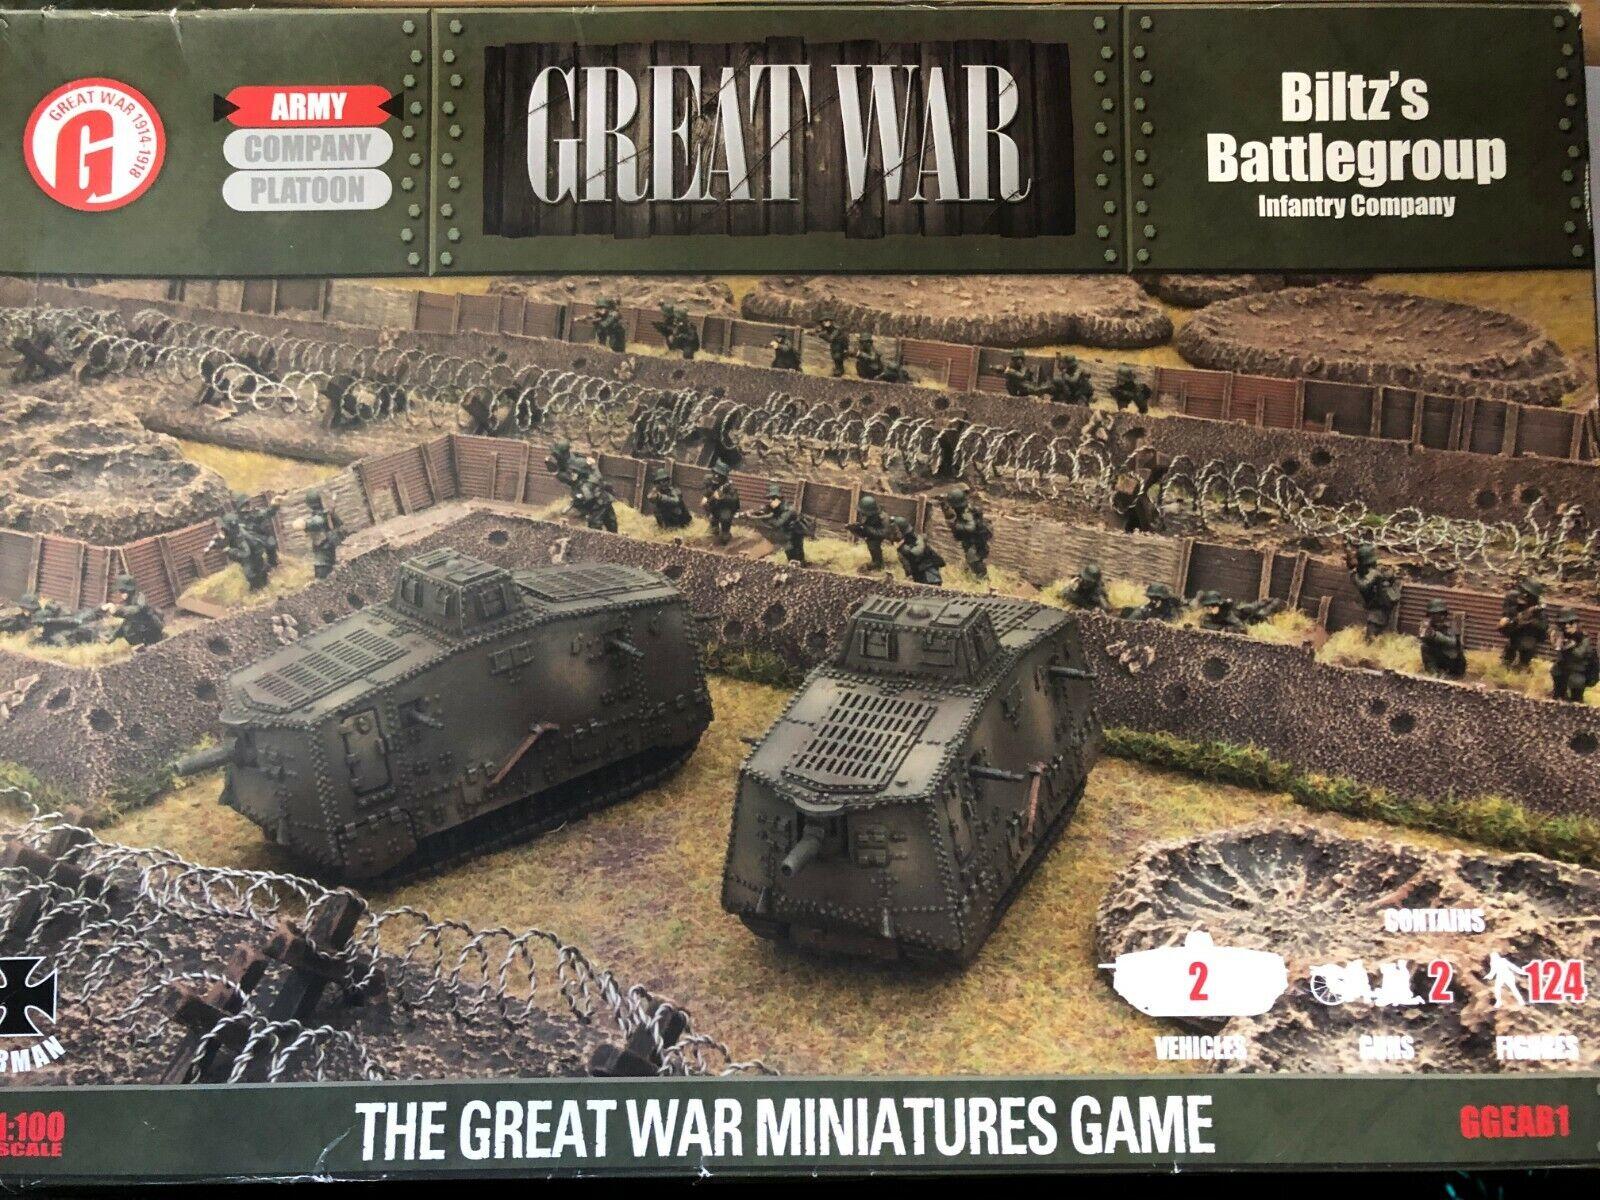 BLITZ'S Battlegroup - Battledavanti -  Ggeab1 - Guerra Mondiale i - Prima Edizione  promozioni